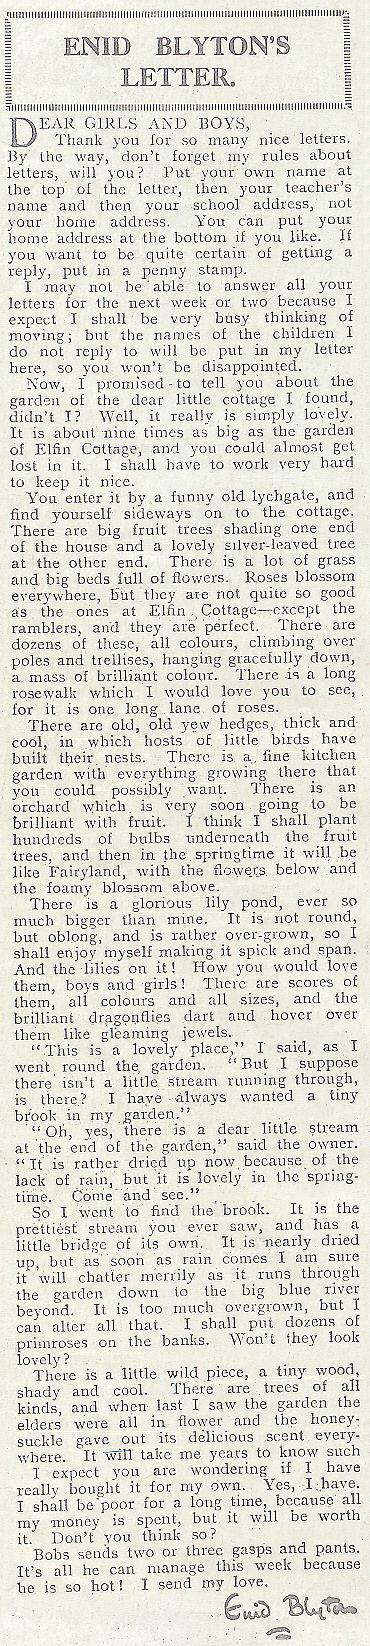 Une lettre d'Enid BLYTON Issue1361-19290724